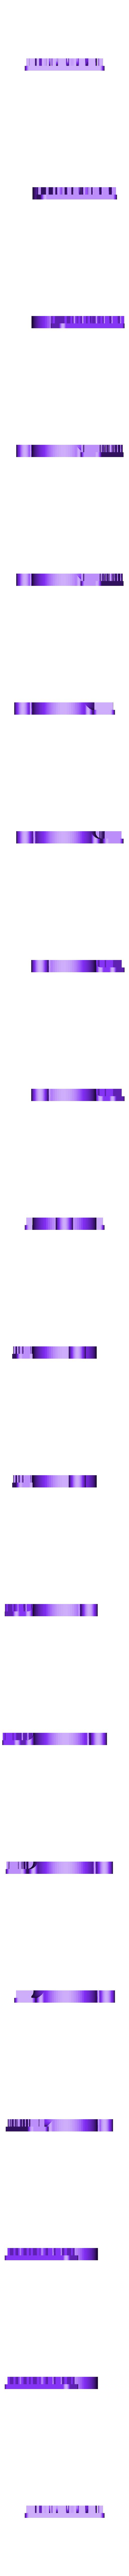 WhiteBody.stl Télécharger fichier STL gratuit TlatPasot (imprimante 3d en hébreu) • Objet à imprimer en 3D, EliGreen